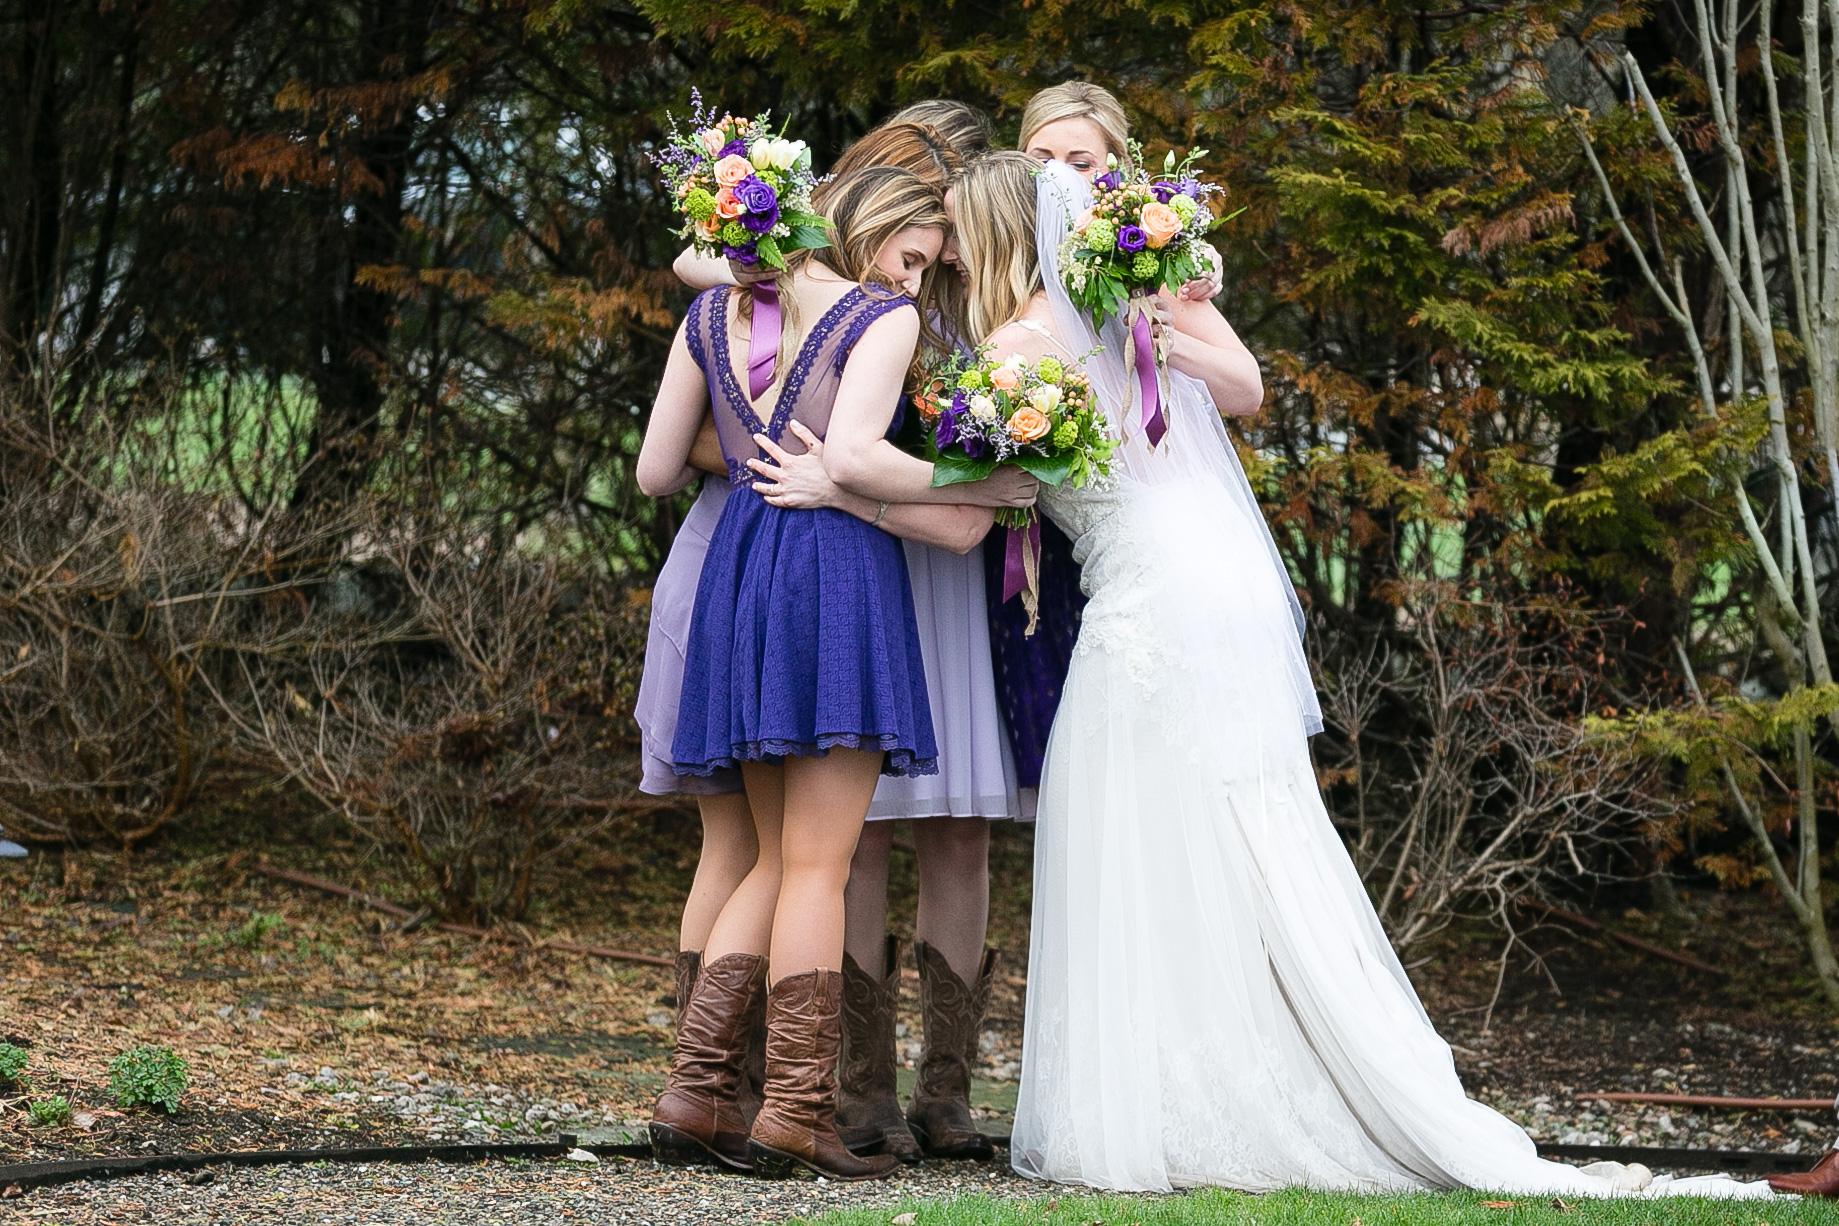 The-Chanler-at-Cliff-Walk-Newport-RI-Wedding-Photojournalistic-Jacek-Dolata-Photography-9.jpg